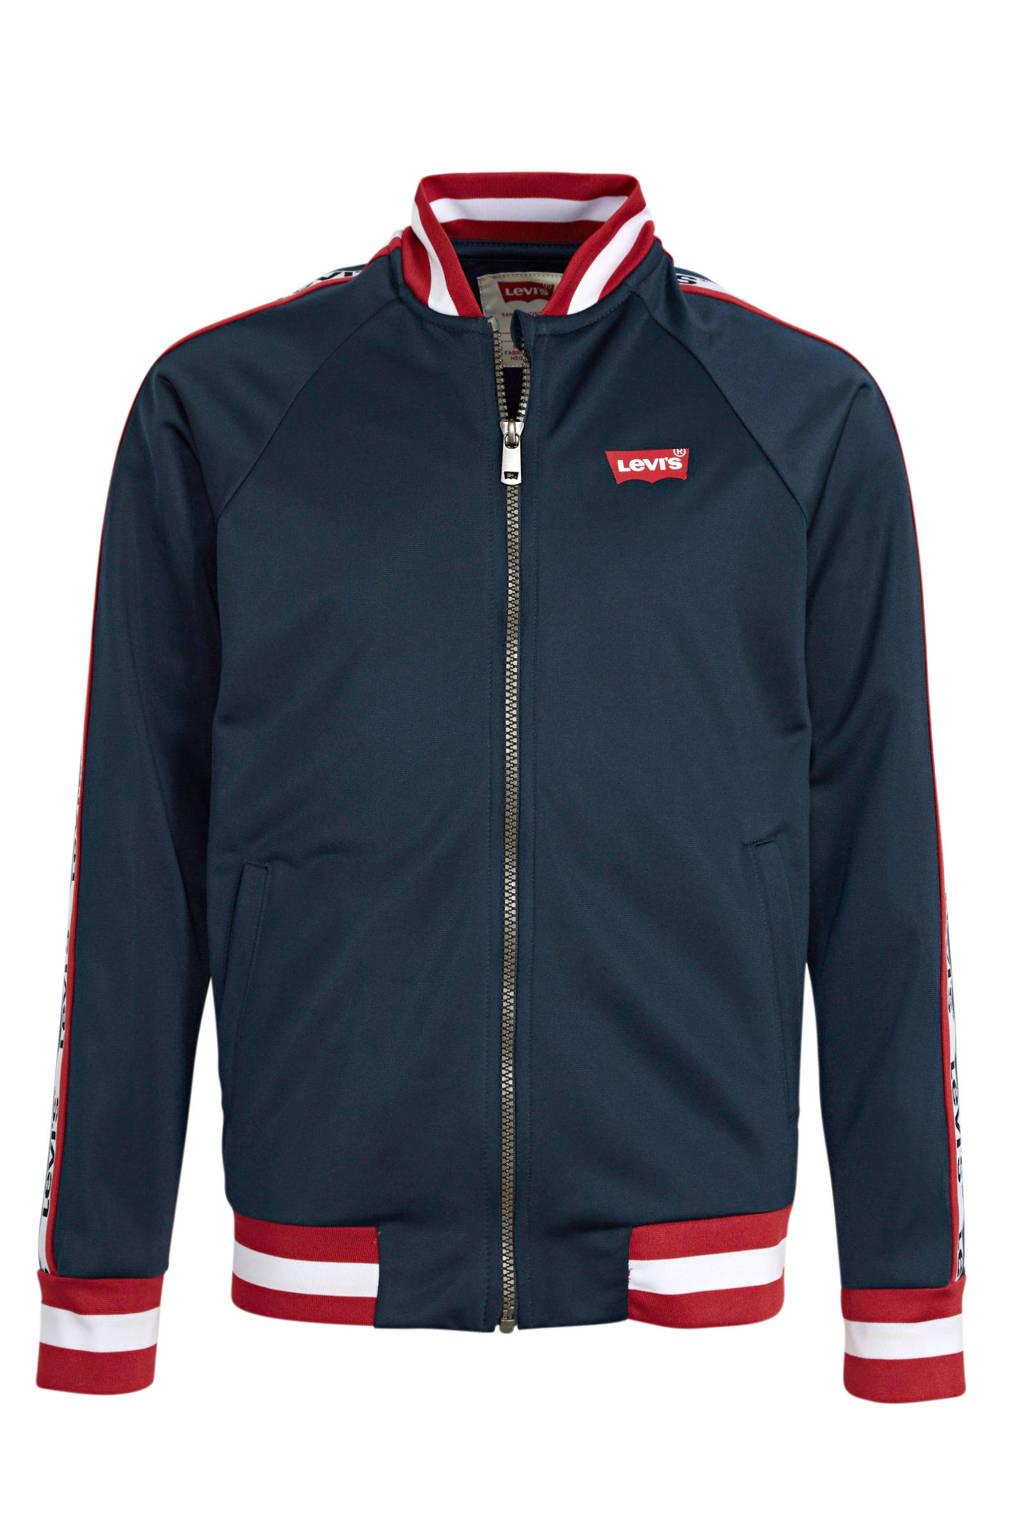 Levi's Kids jas met logo donkerblauw/rood/wit, Donkerblauw/rood/wit